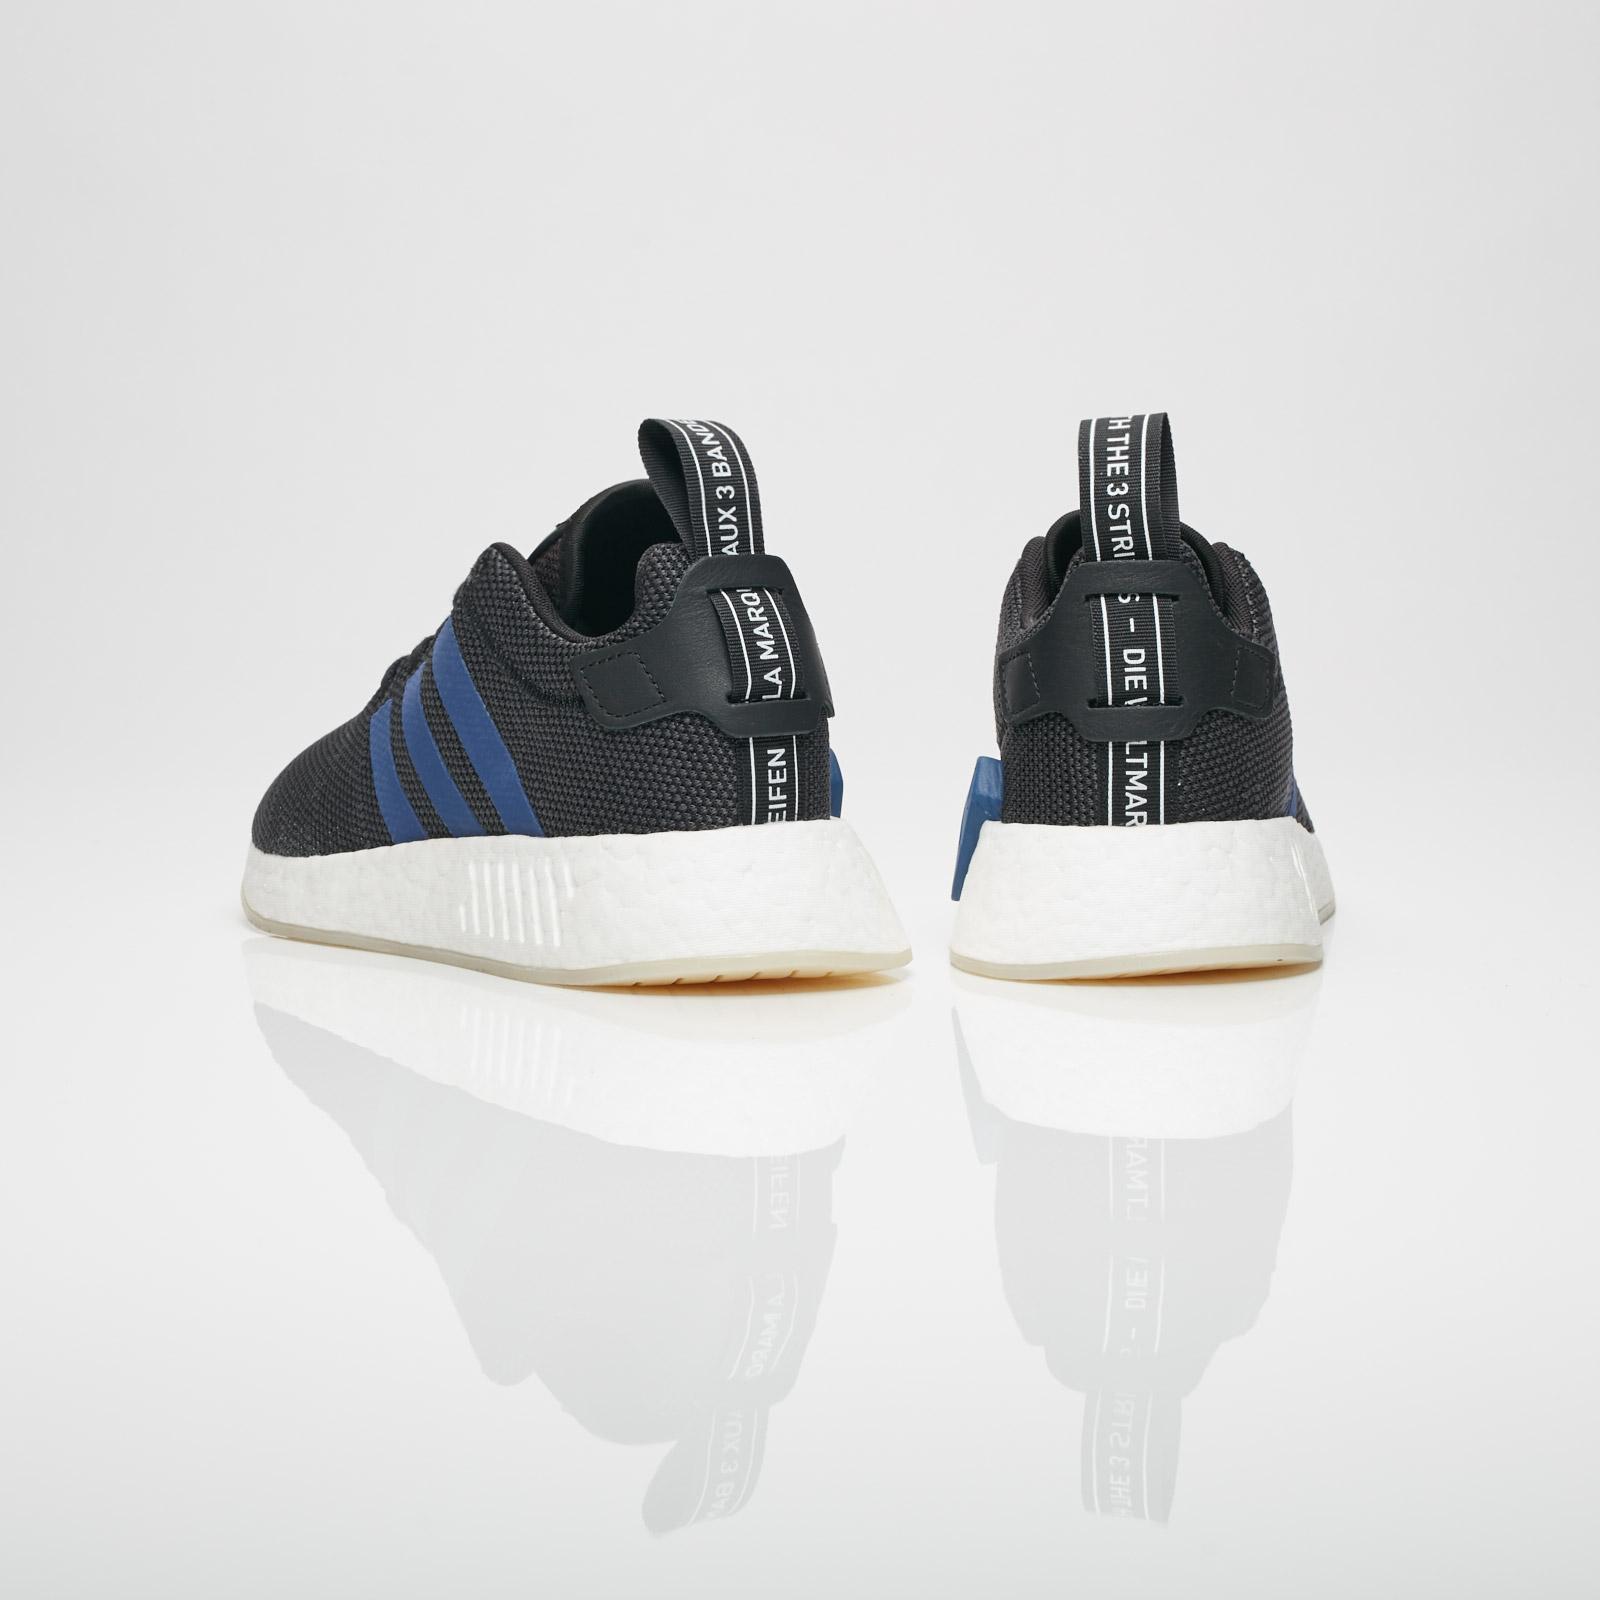 eb92abd71 adidas Nmd R2 W - Cq2008 - Sneakersnstuff